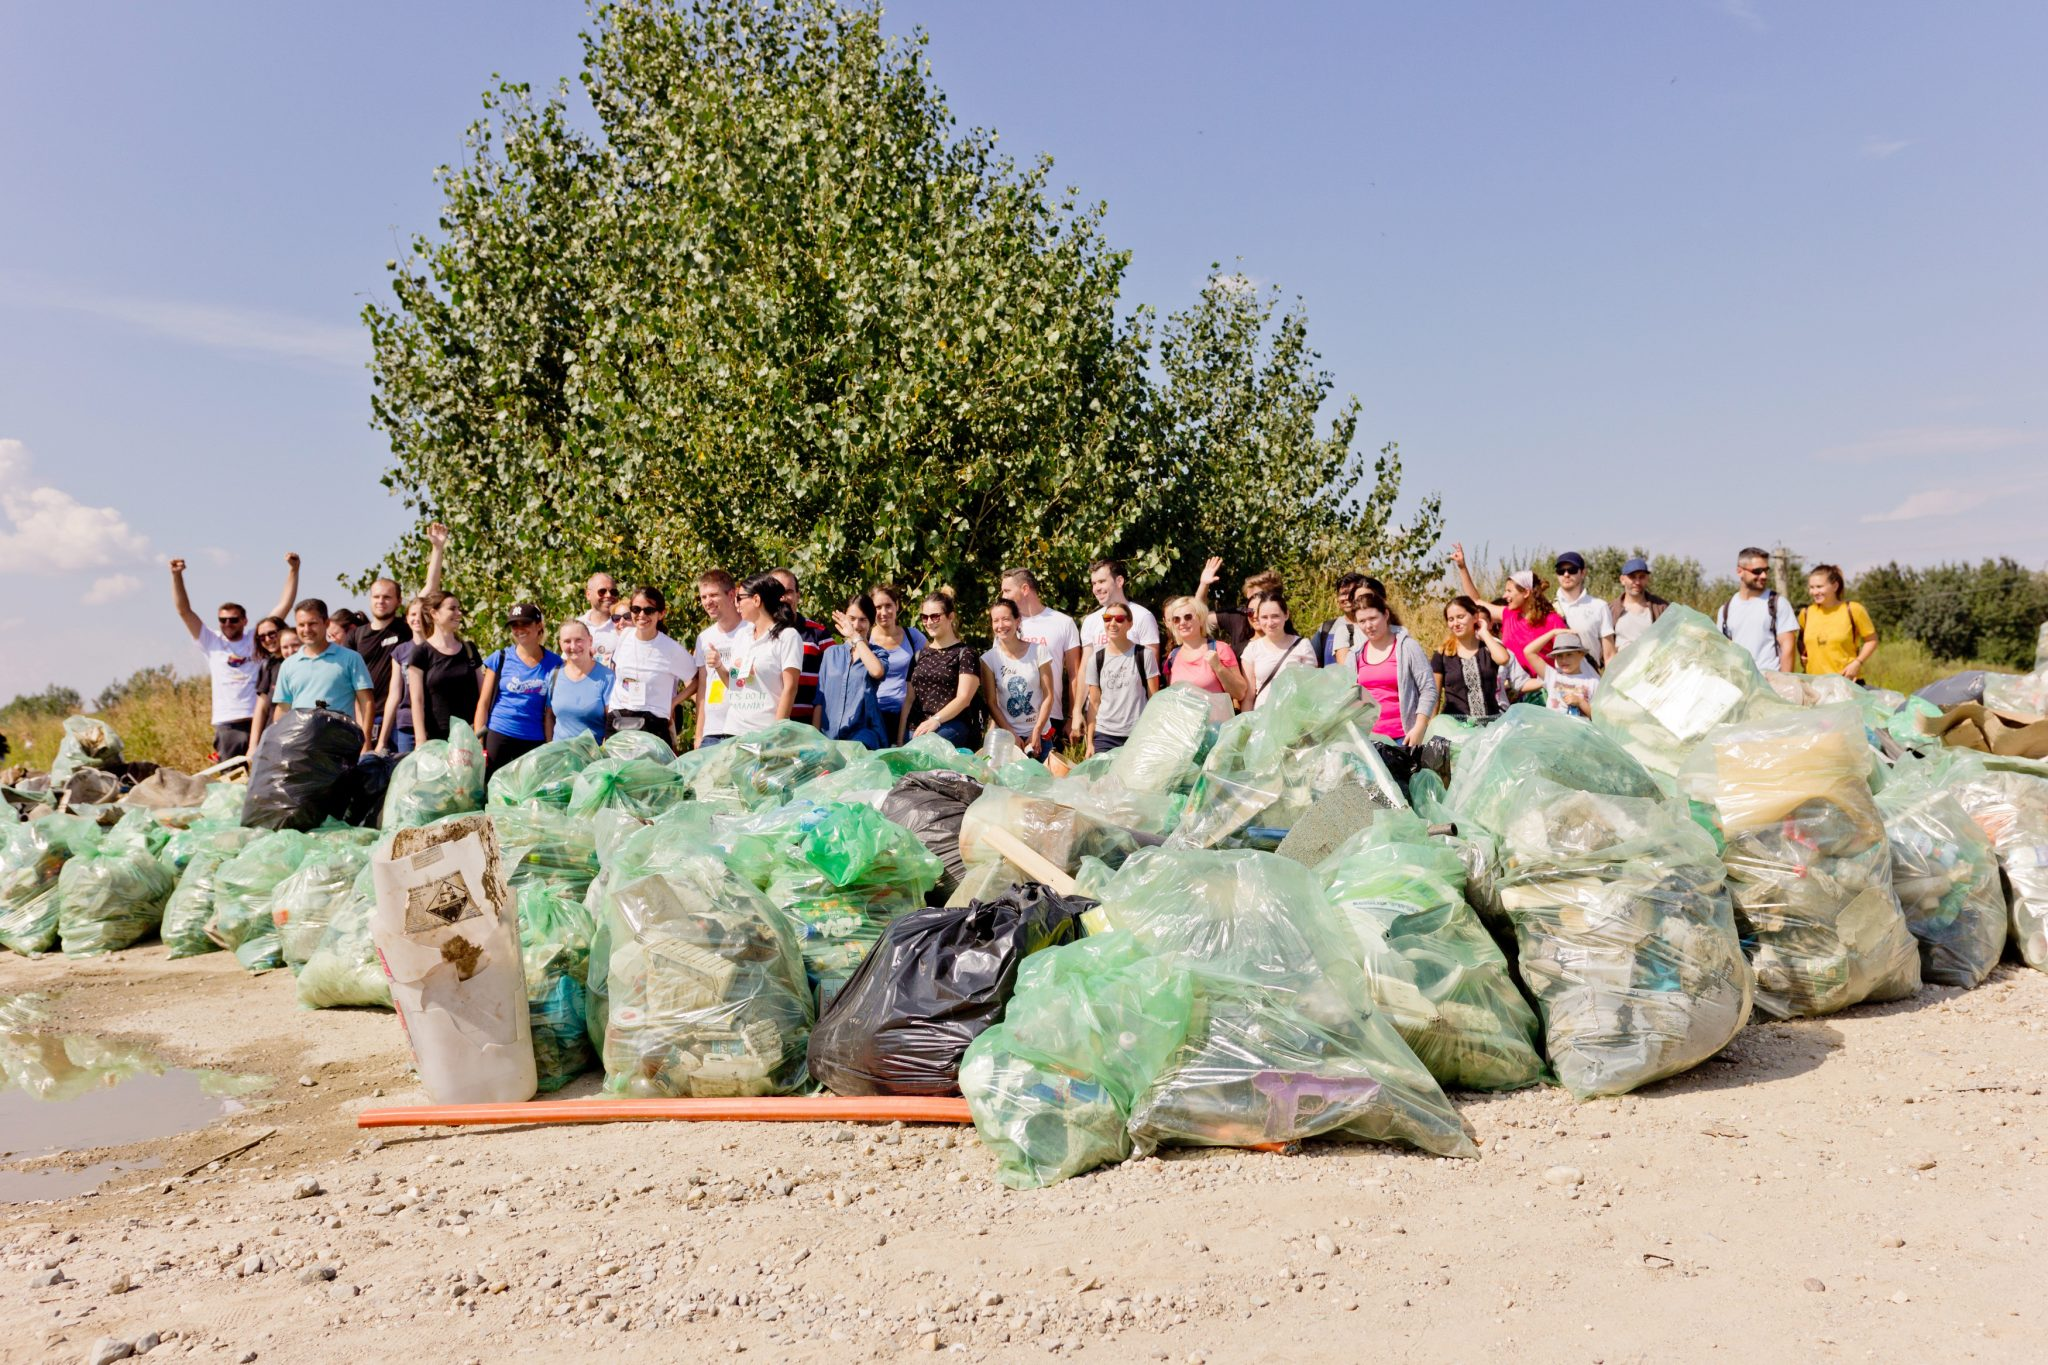 voluntari cu saci